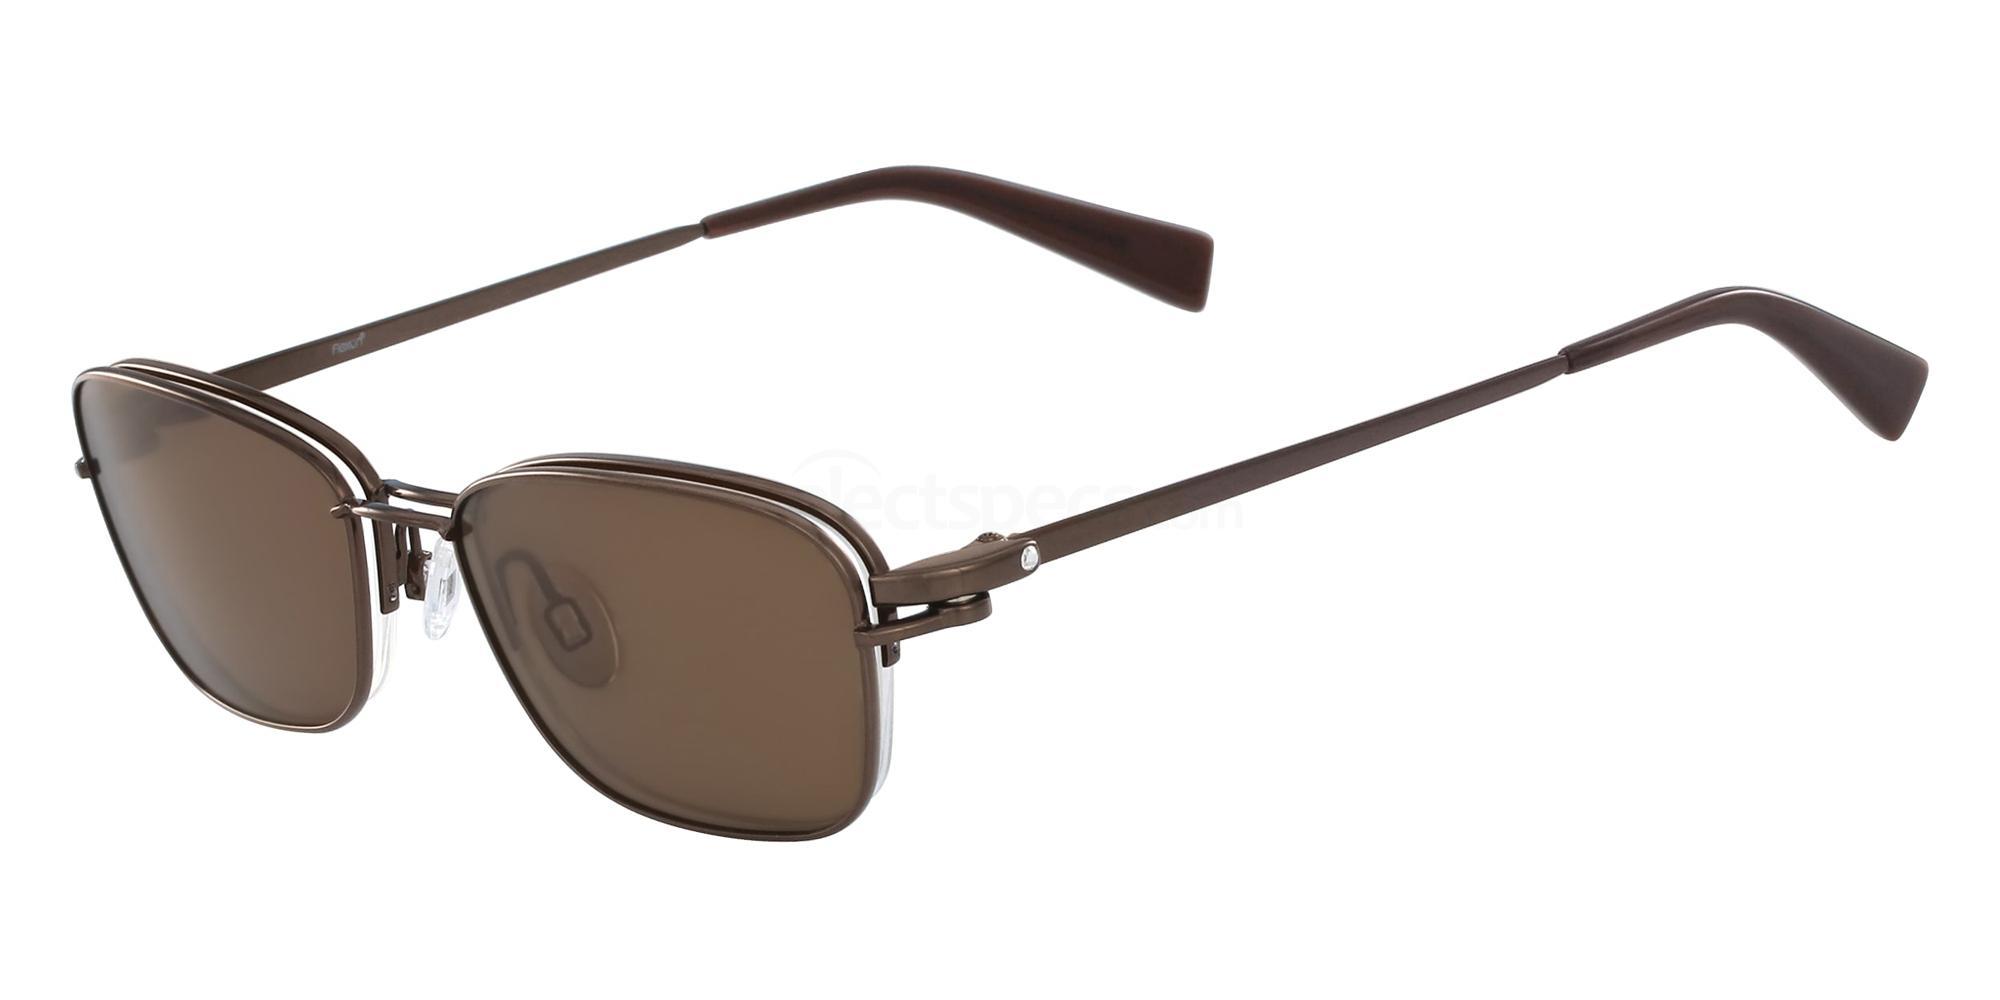 13ee858041db flexon flx906 mag set glasses free lenses   delivery omnioptics australia.  SELECTSPECS